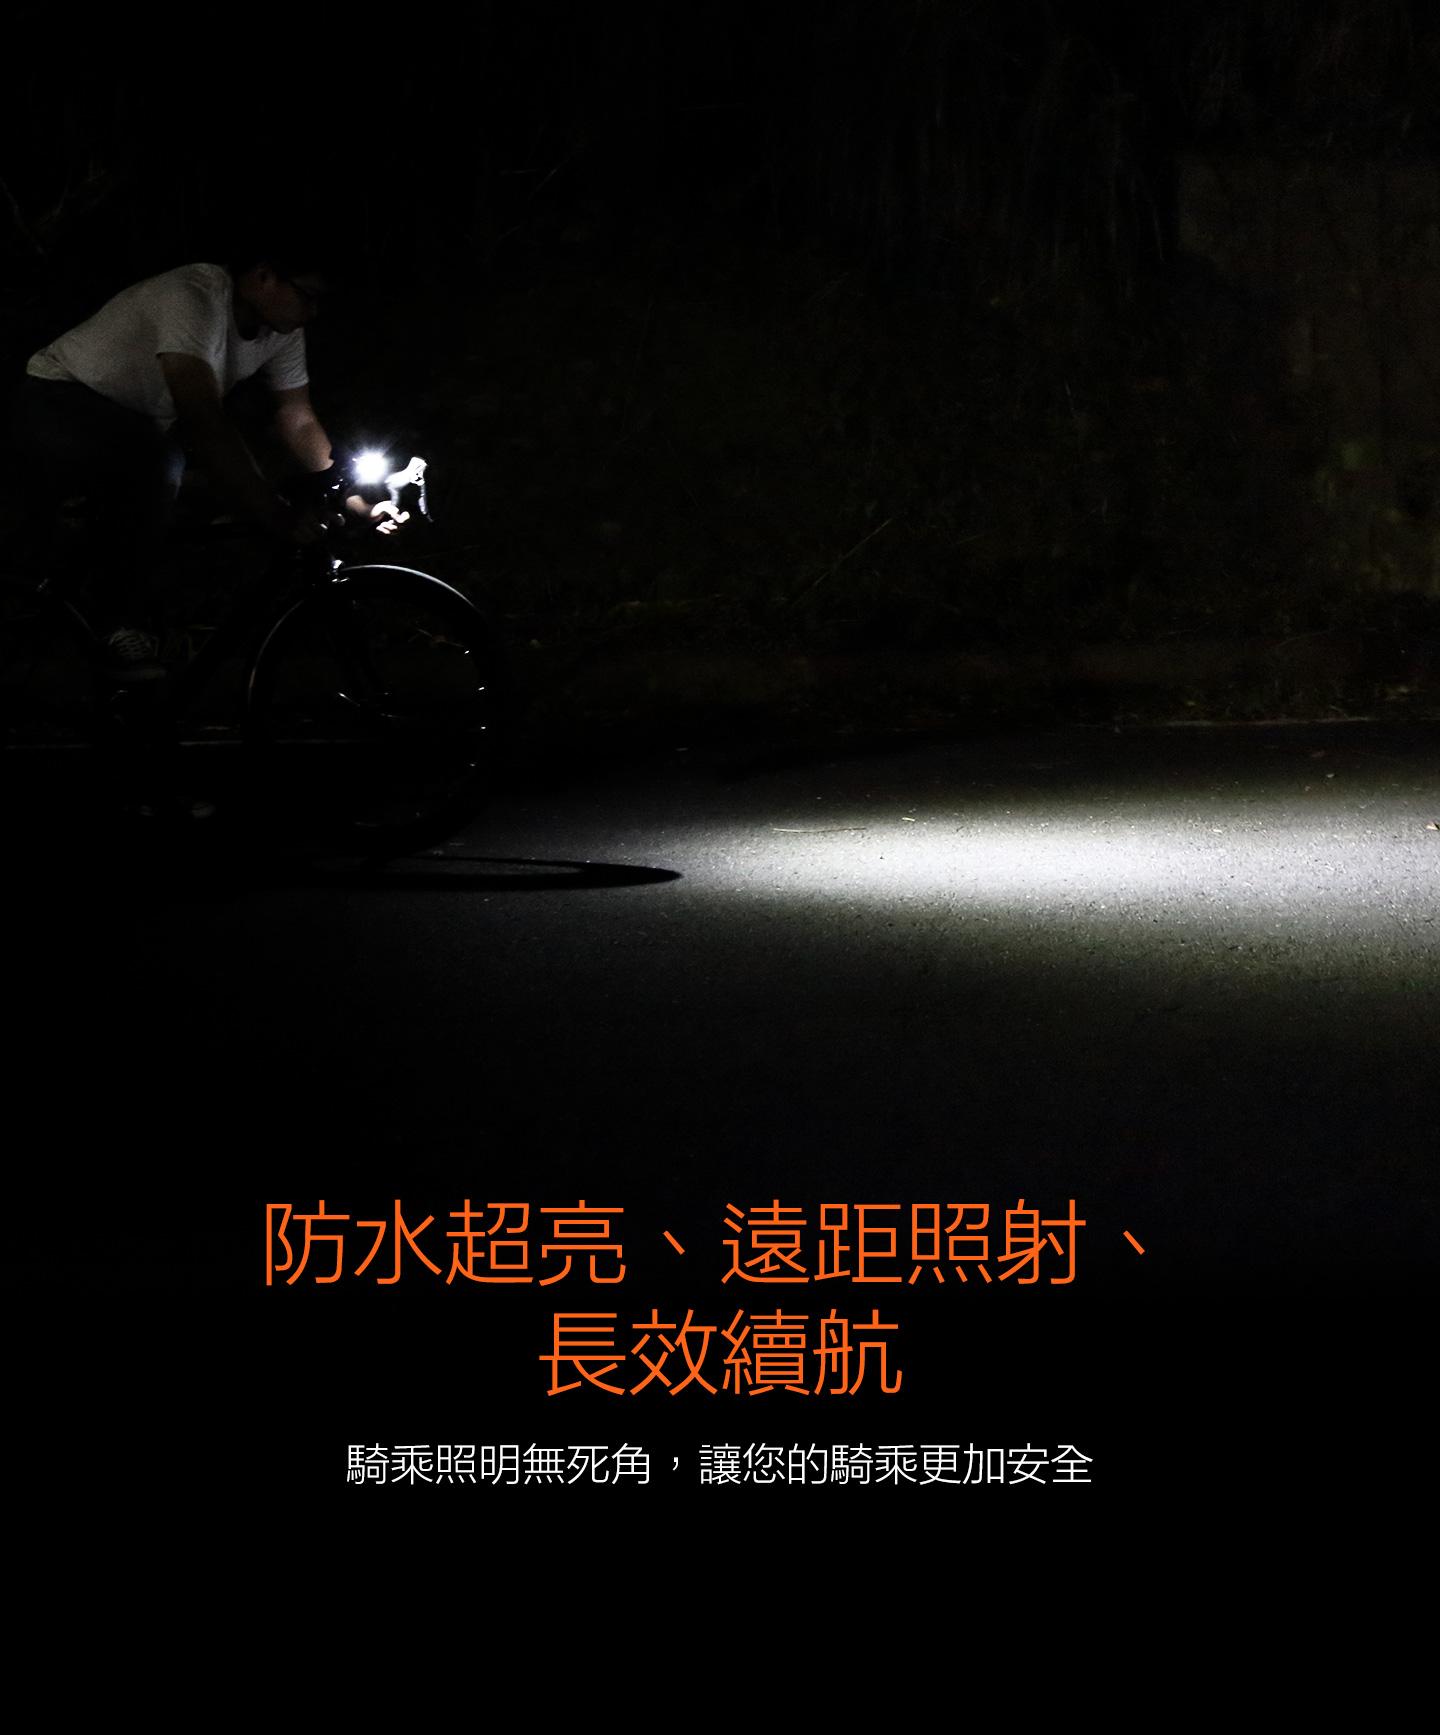 banner01_1003_zh_m